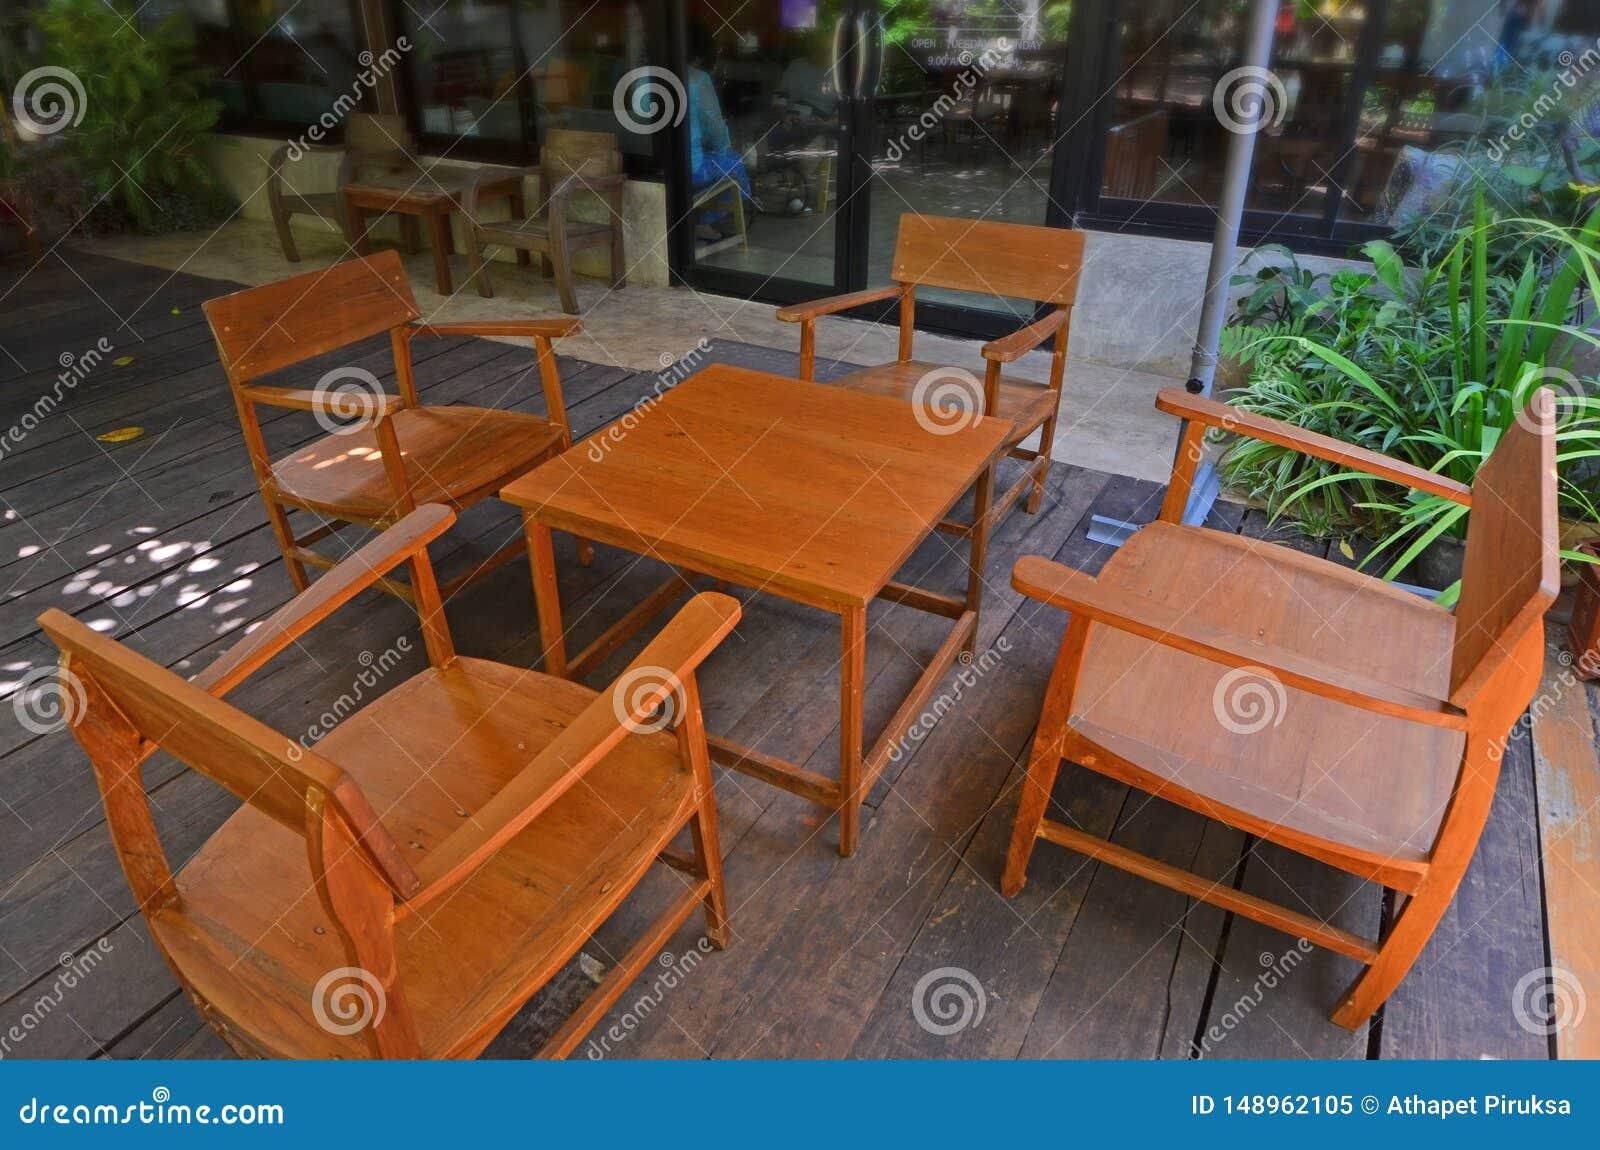 Beautiful Golden Teak Table Set On Wooden Floor Stock Image Image Of Rest Bench 148962105